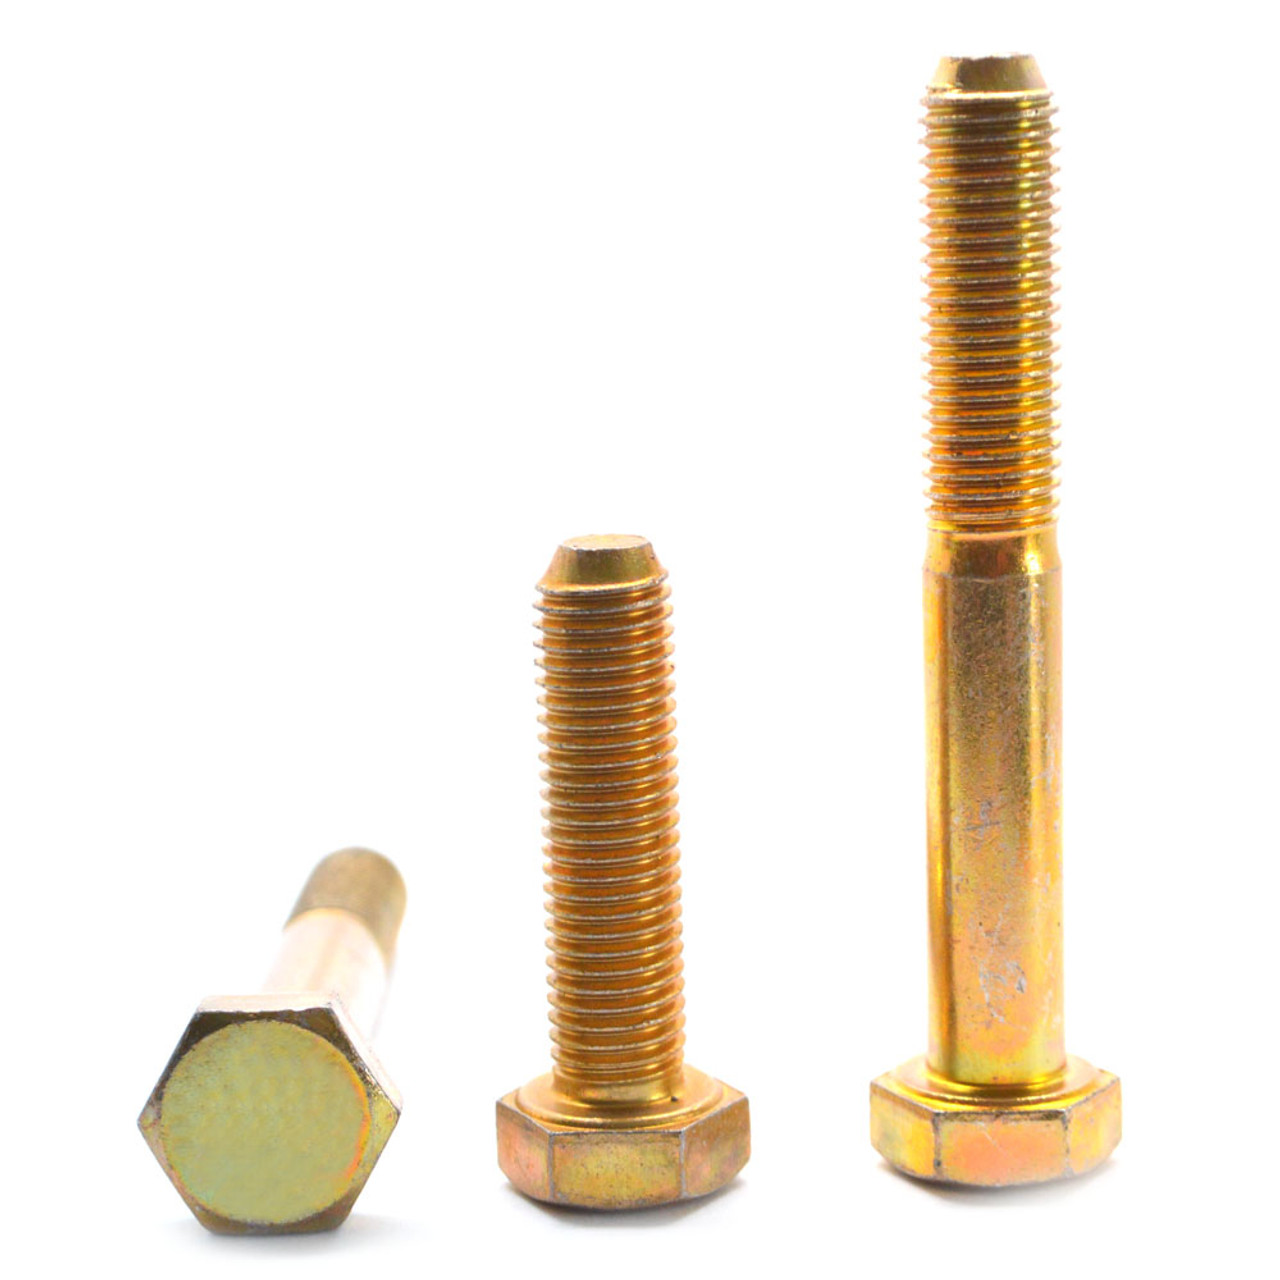 "5/8""-11 x 12"" (PT) Coarse Thread Grade 8 Hex Cap Screw (Bolt) Alloy Steel Yellow Zinc Plated"